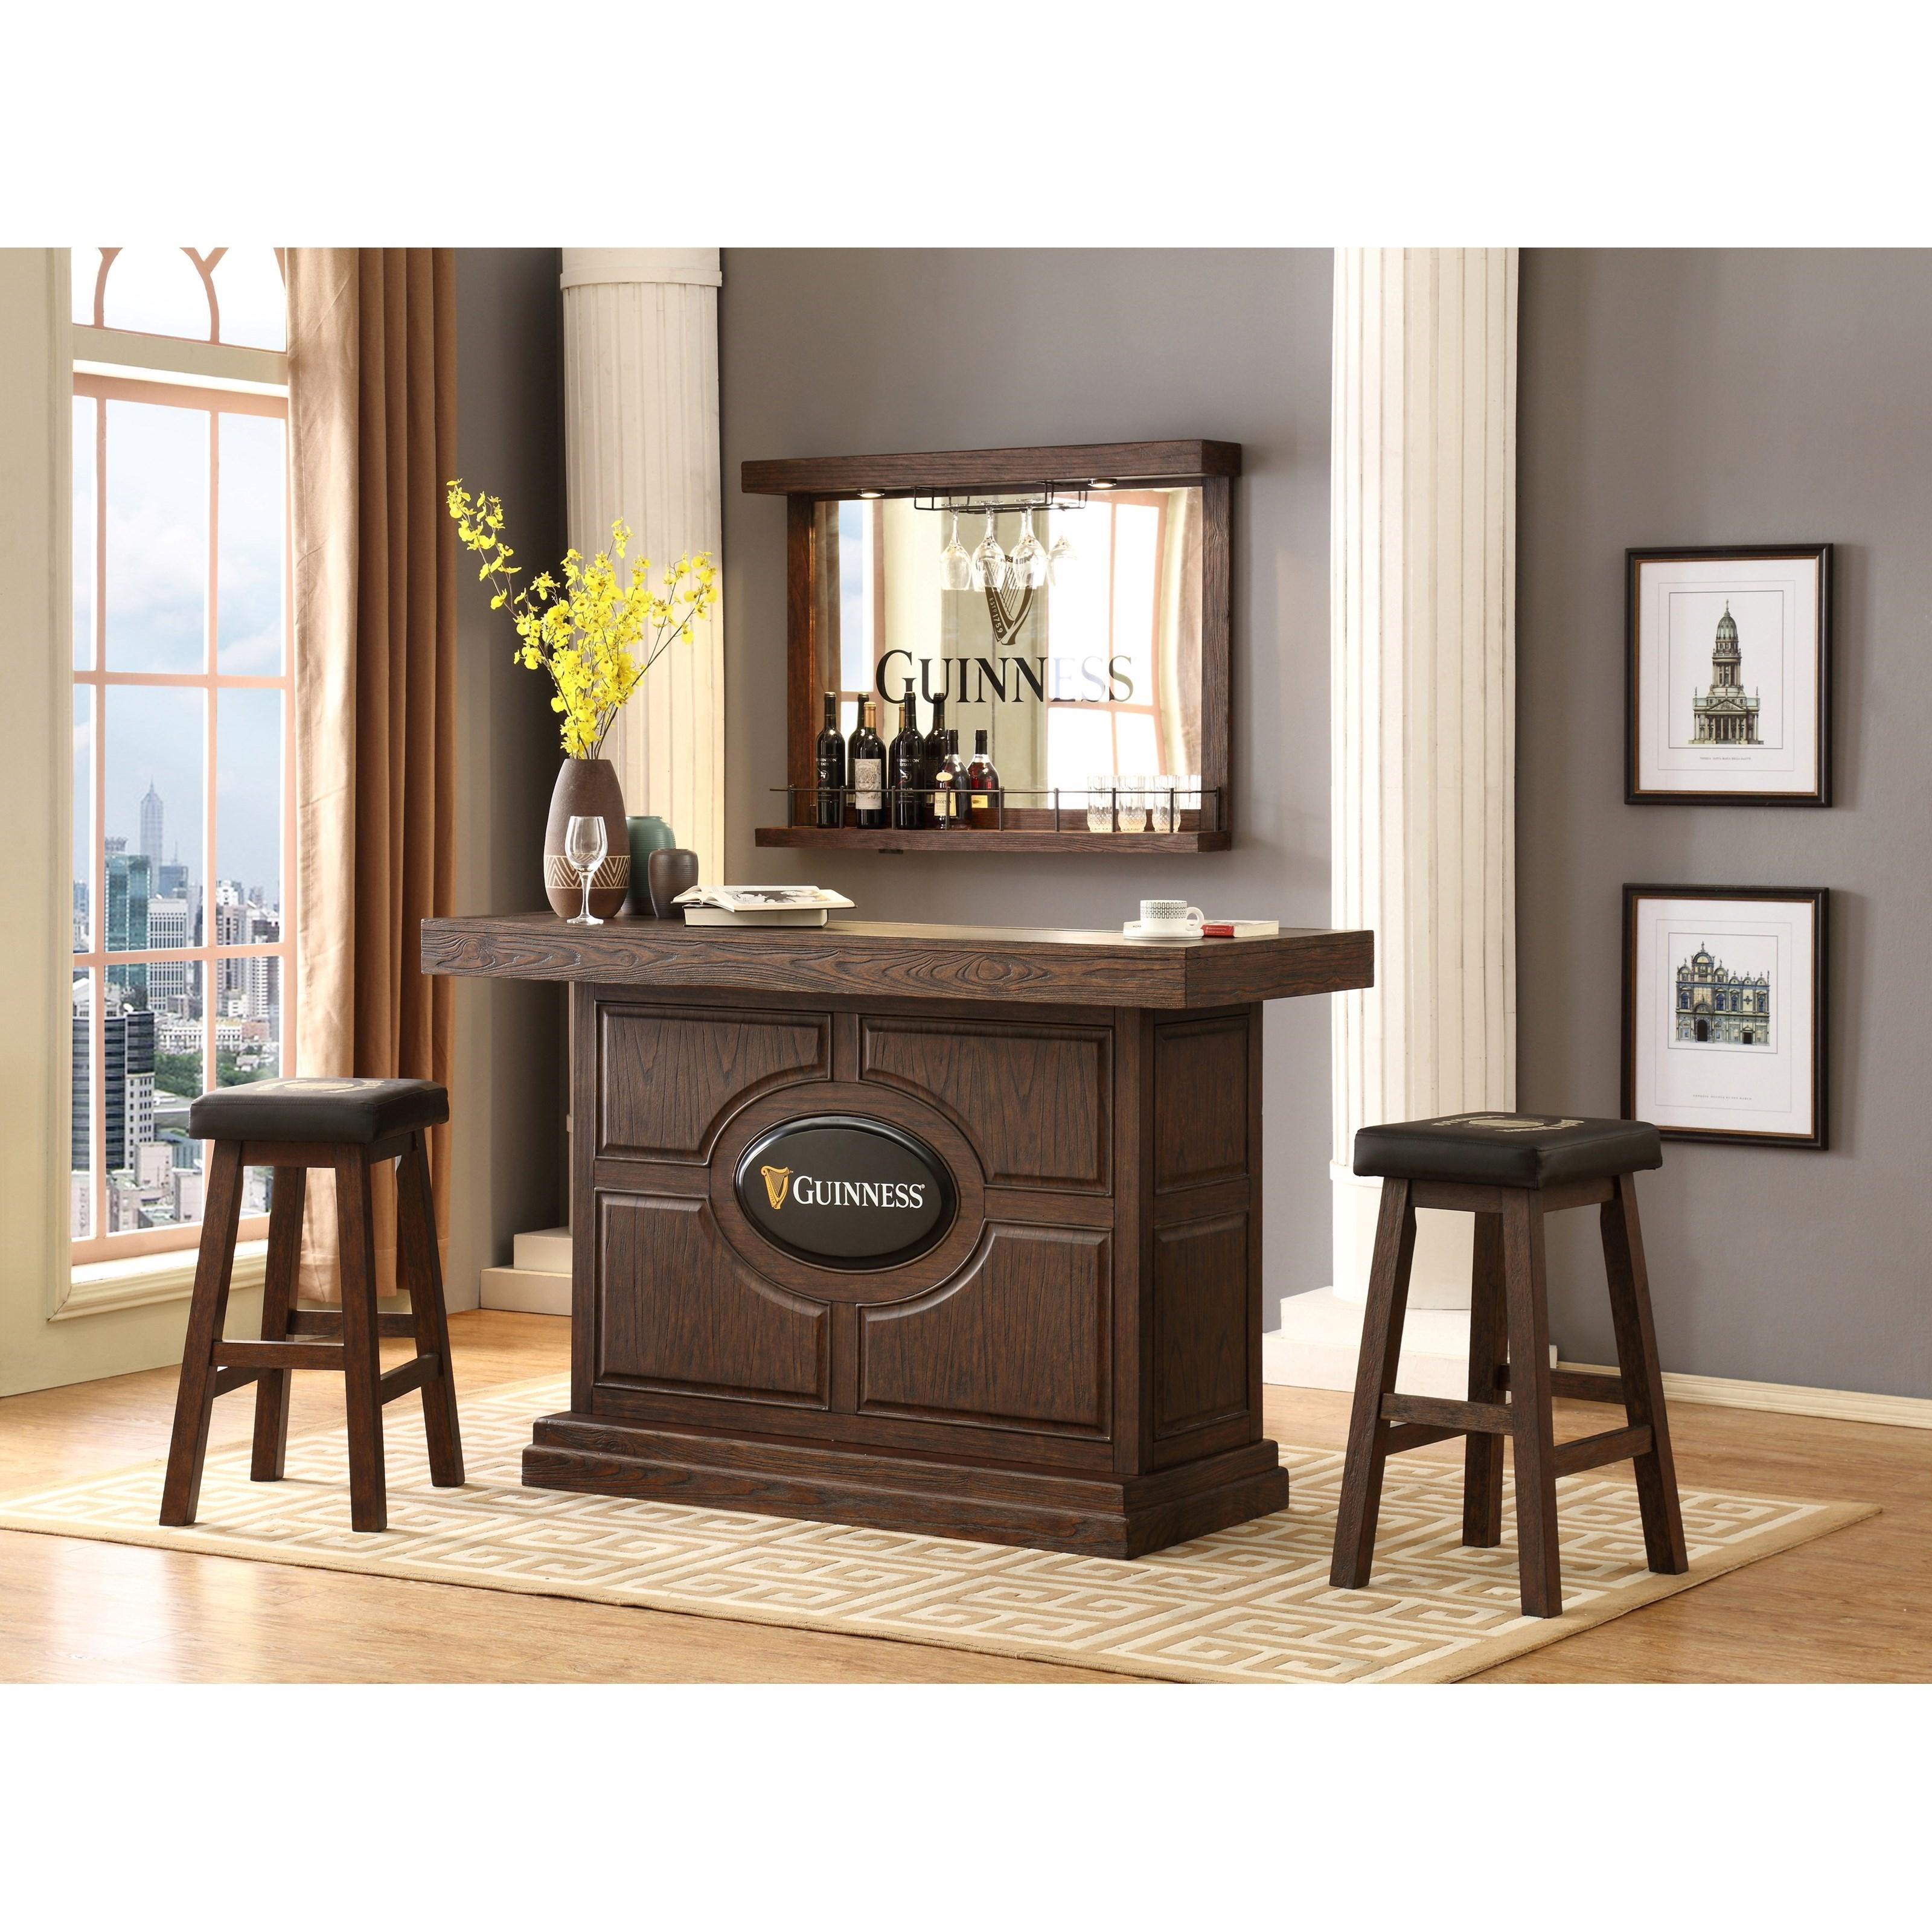 E C I Furniture Guinness Bar Guinness Bar Set With Stools